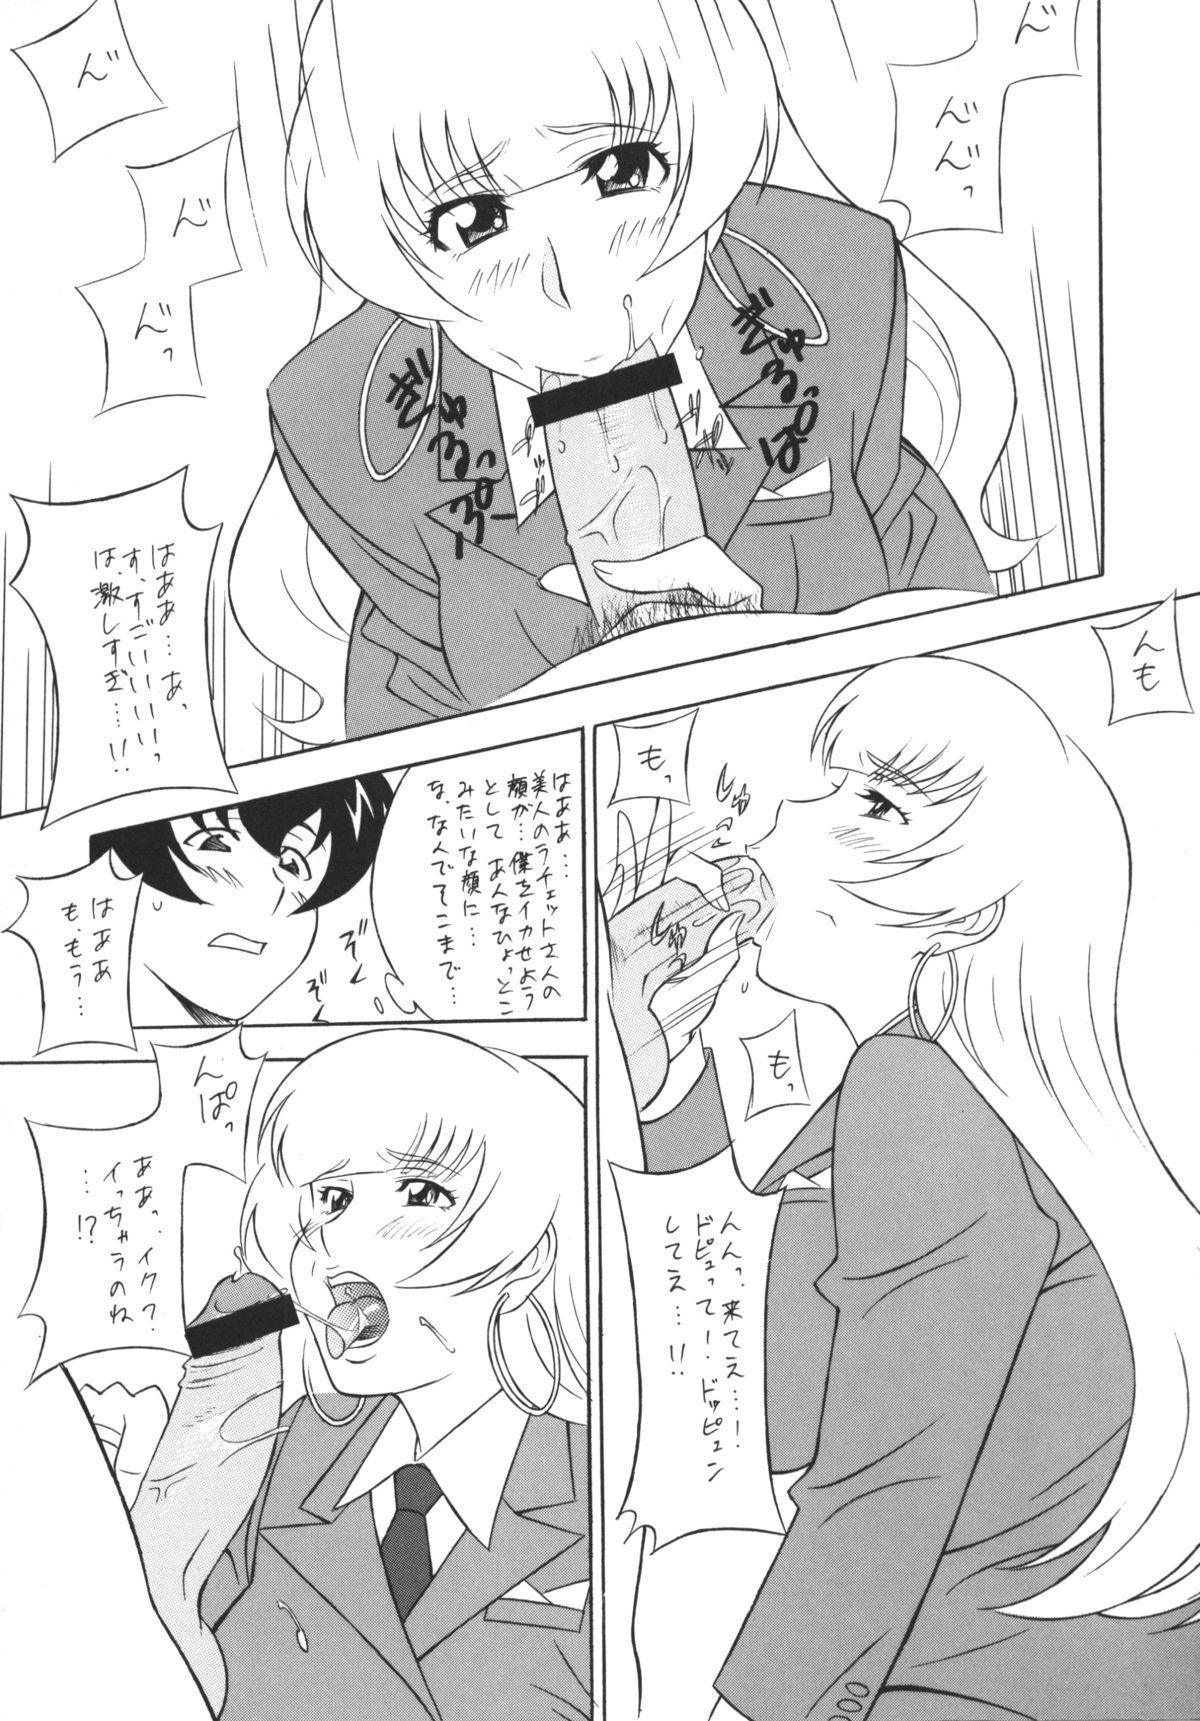 [Okachimentaiko (H-H, Minazuki Akira) Oh! Hentai (Various) 53